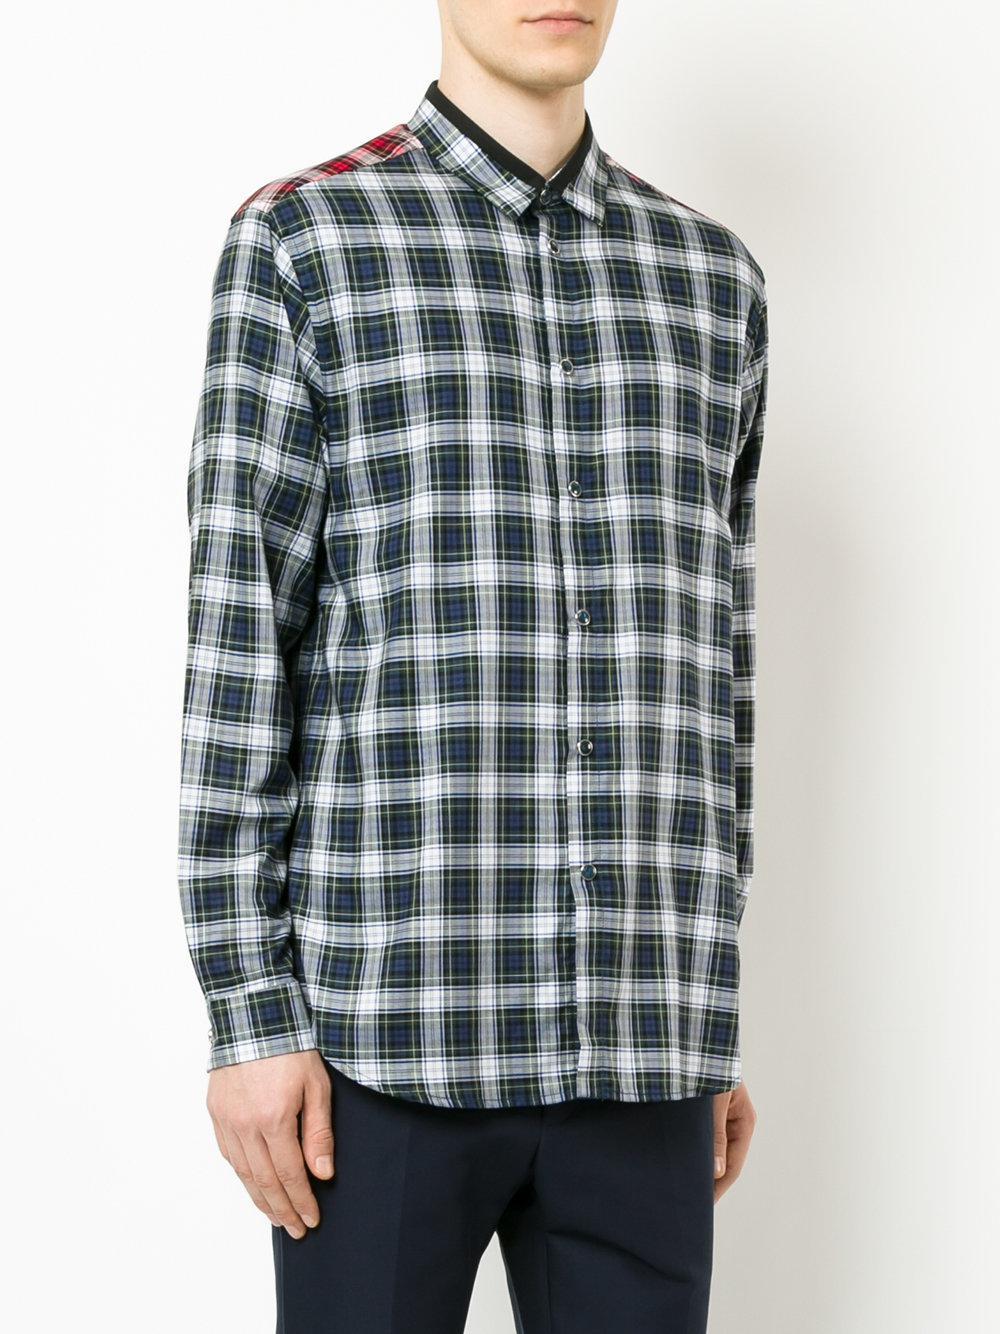 Lyst N 21 Plaid Shirt In Green For Men